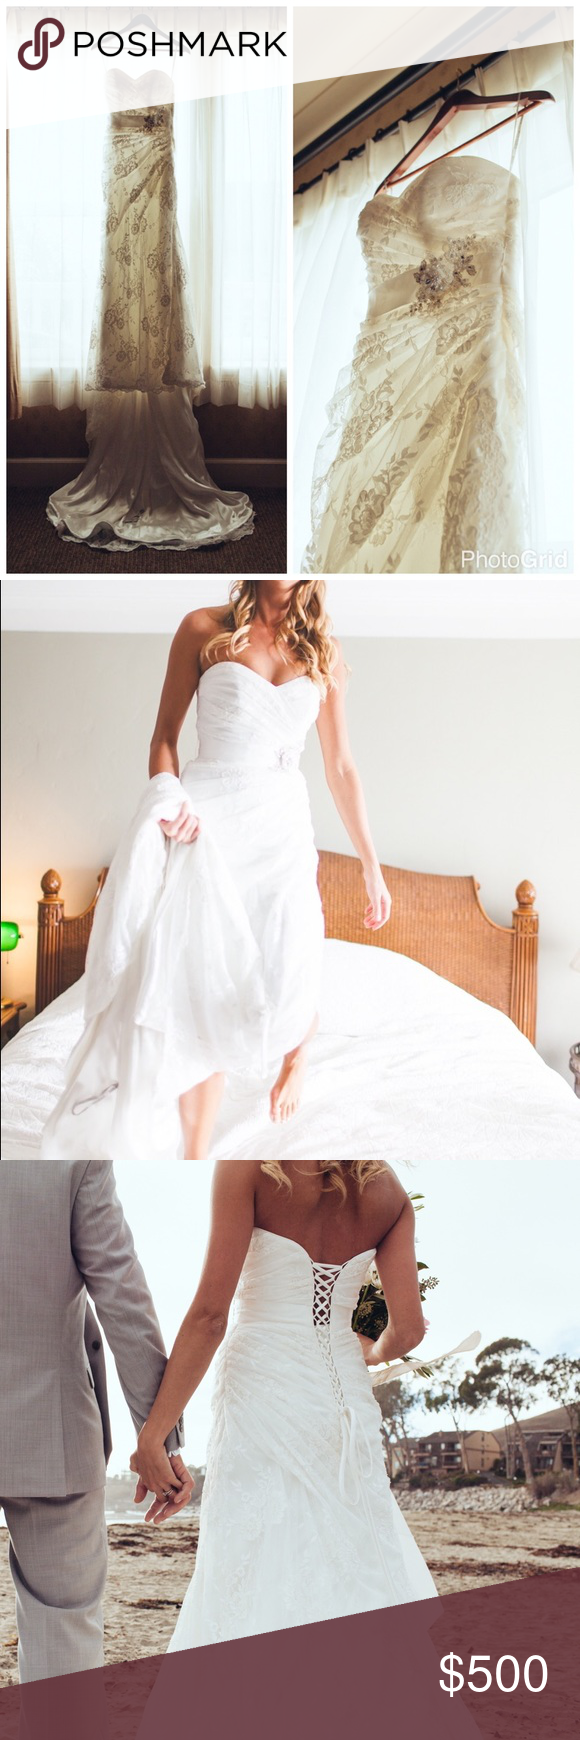 Wedding dress cups  Maggie Sottero uMyrau wedding dress  My Posh Picks  Pinterest